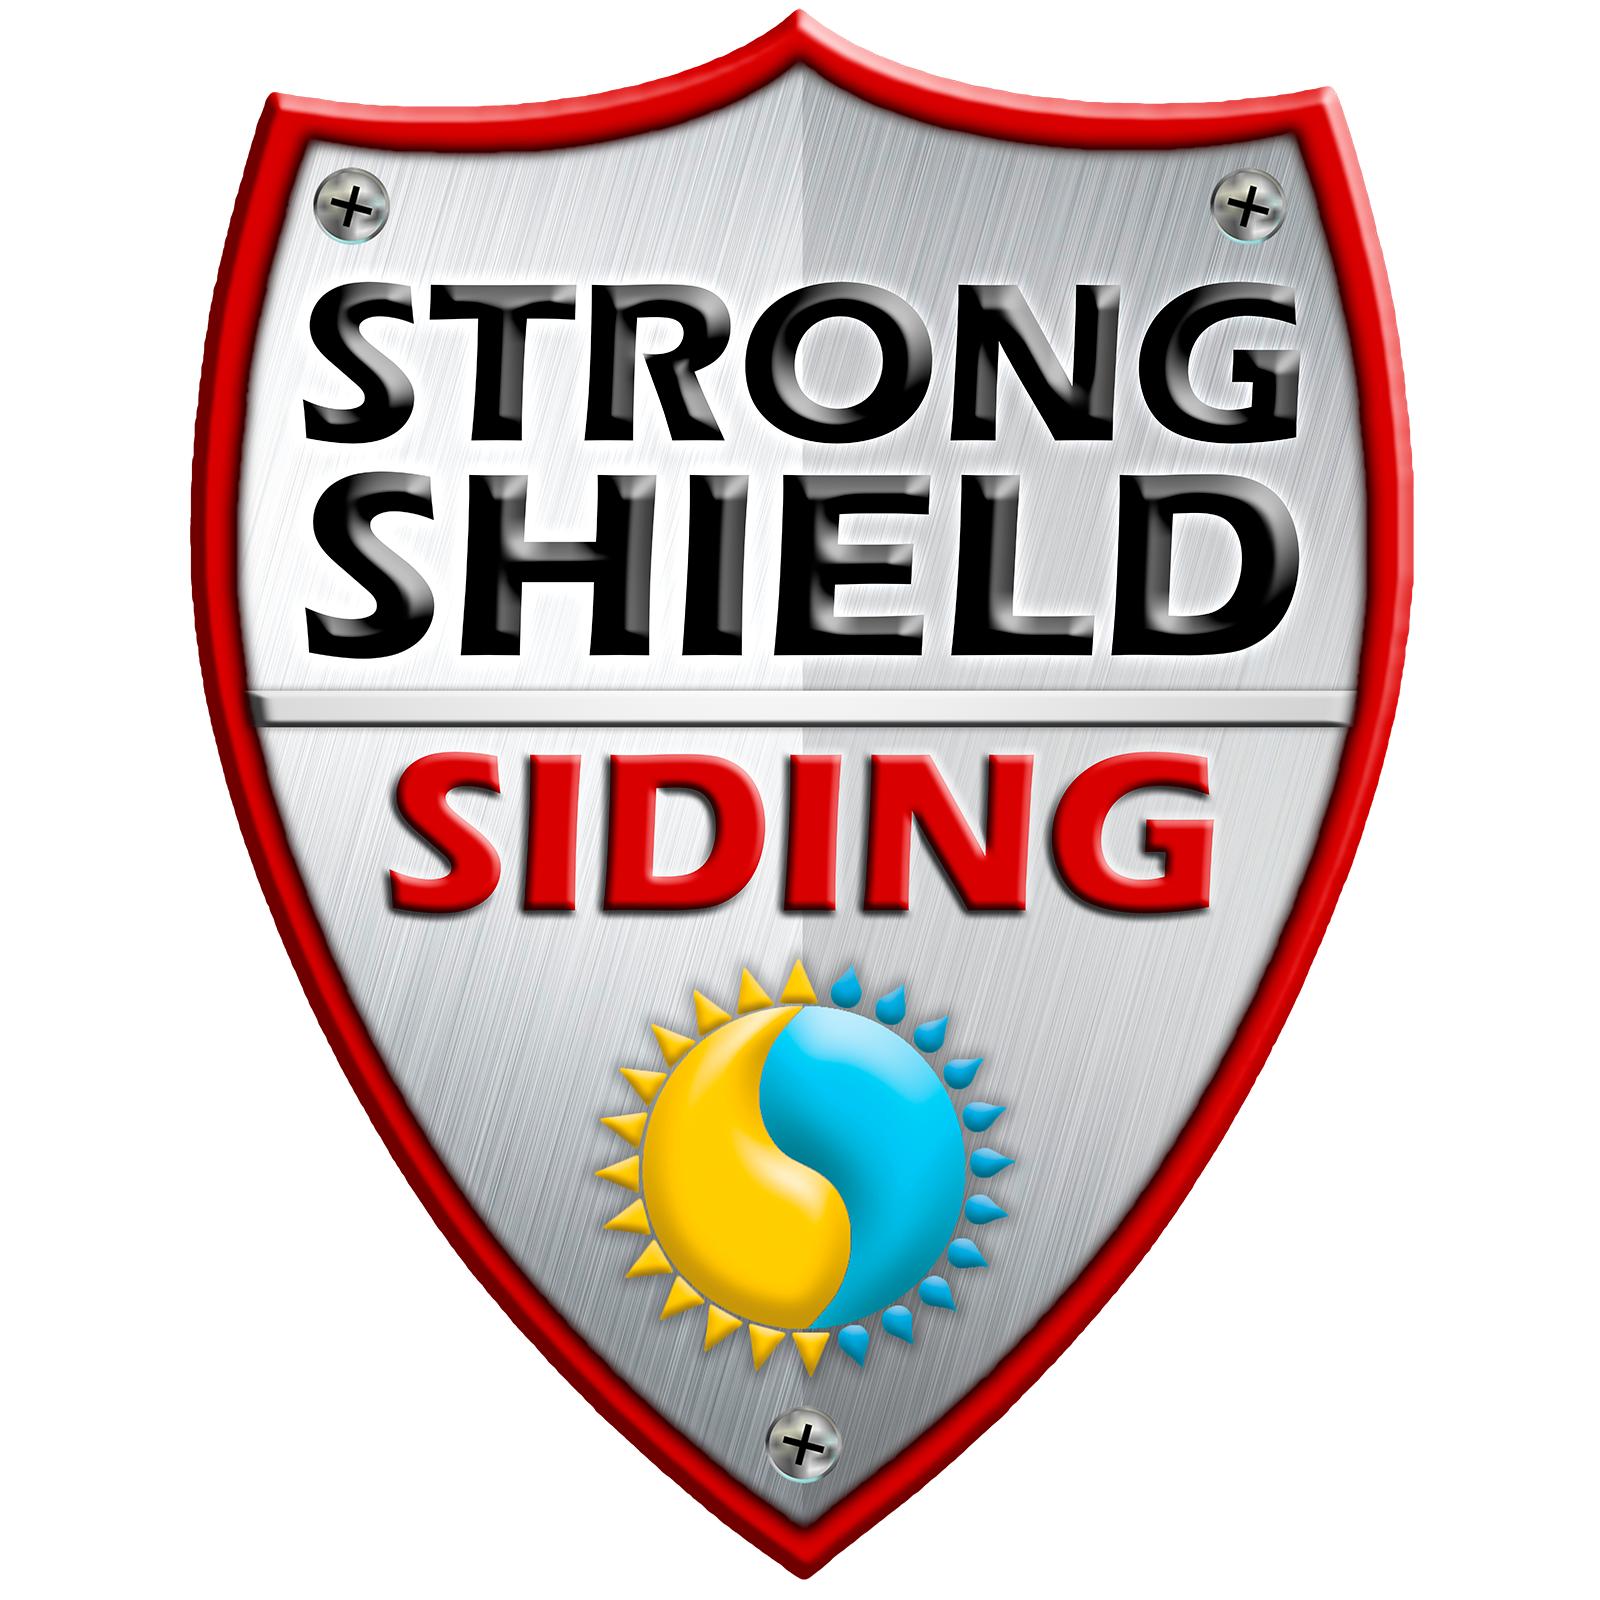 Strong Shield Siding Llc In Kenner La 70062